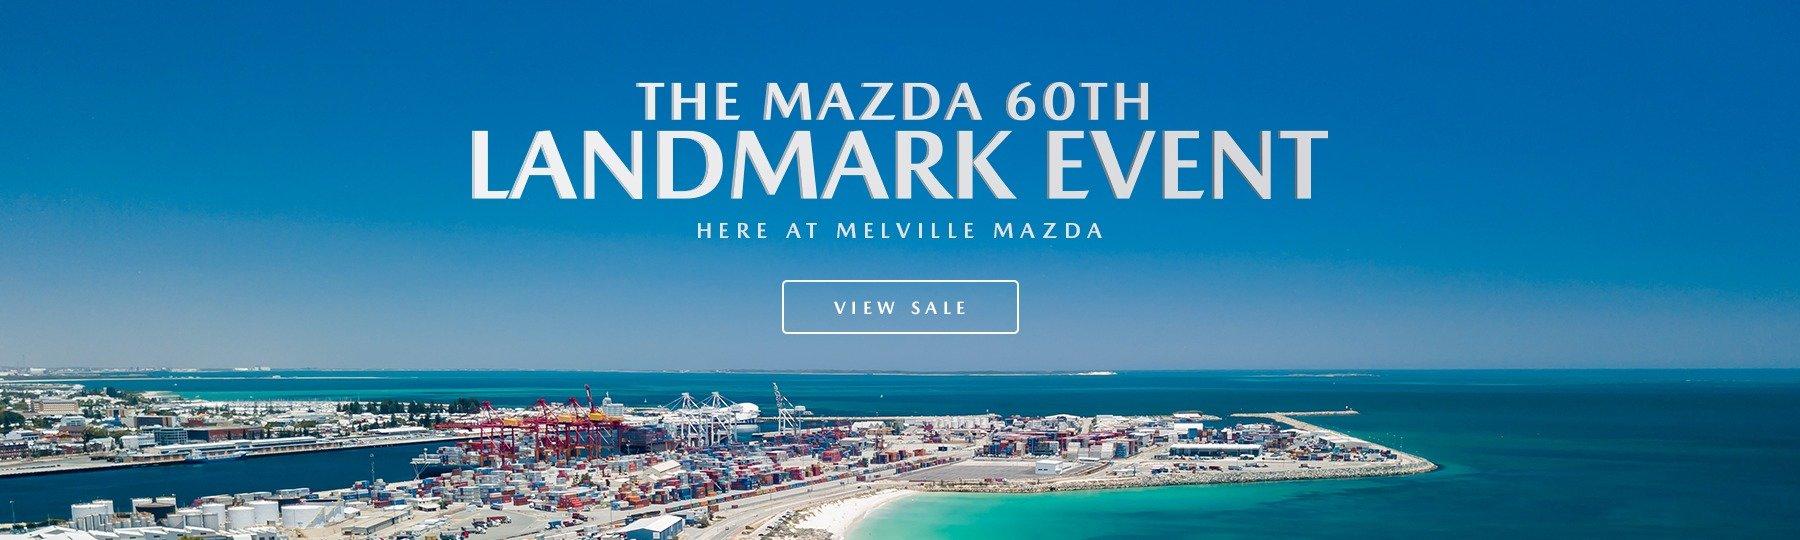 Mazda Landmark Event